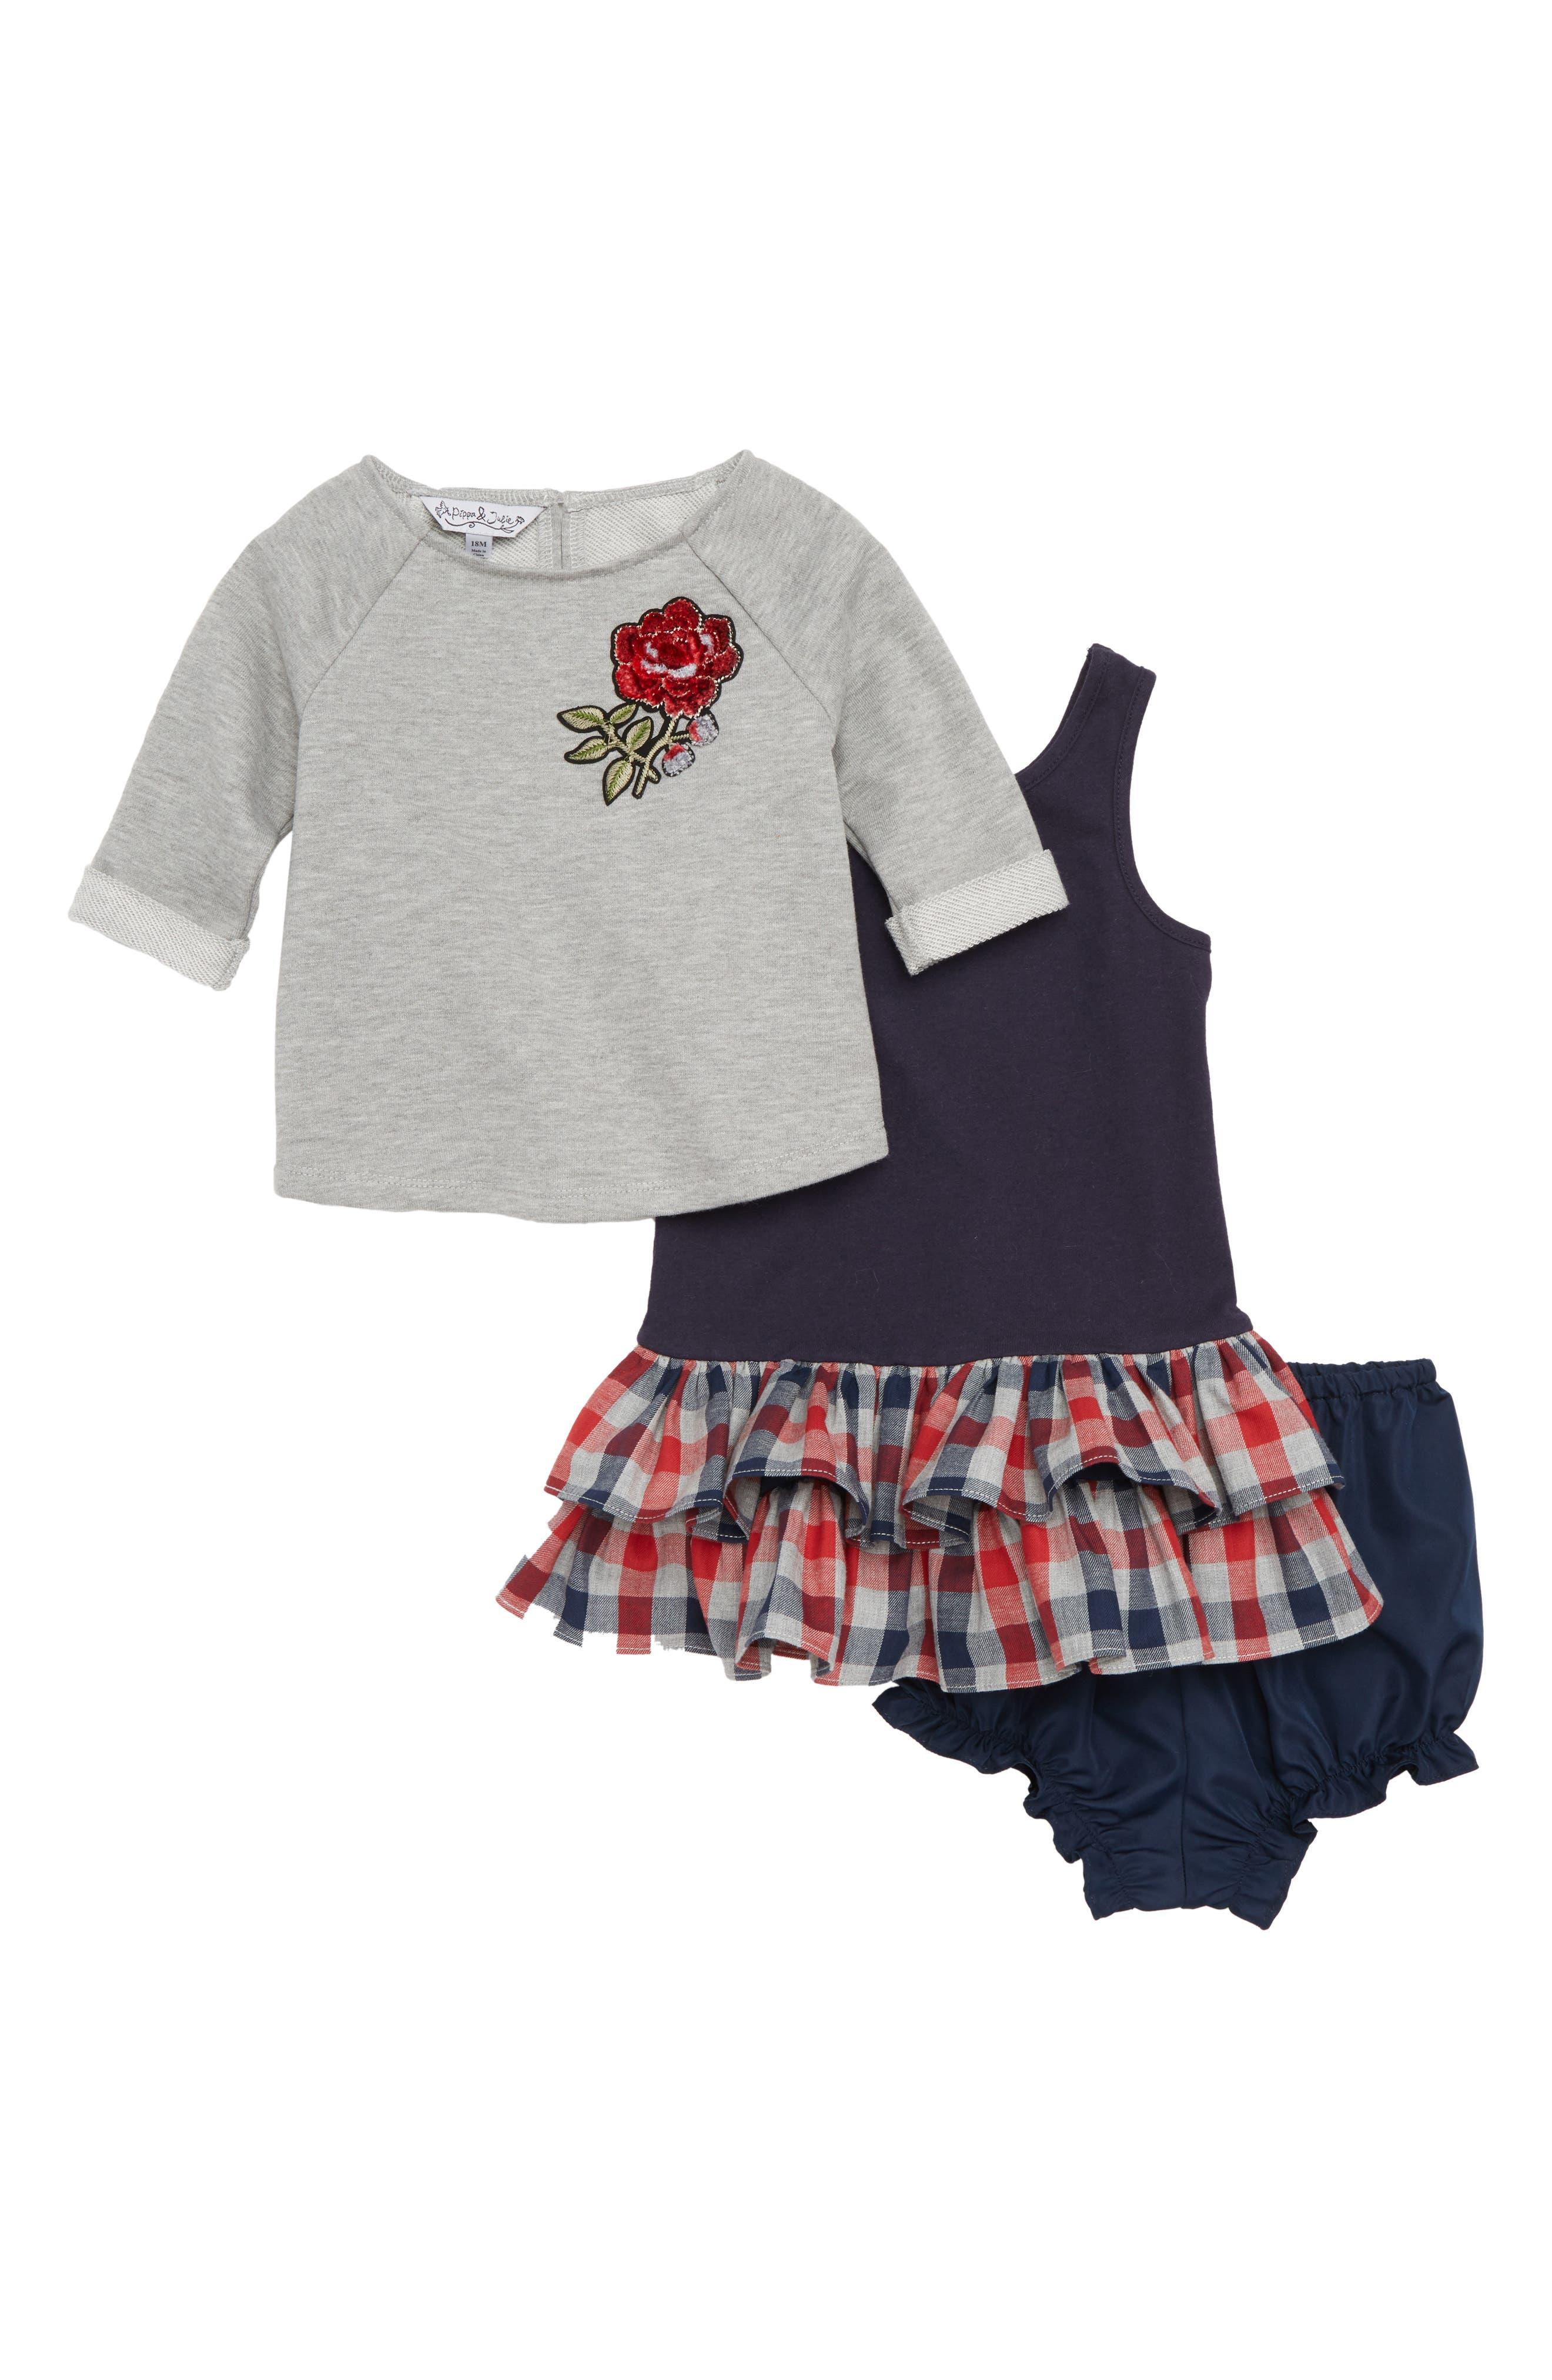 Rose Sweatshirt & Dress Set,                         Main,                         color, 020